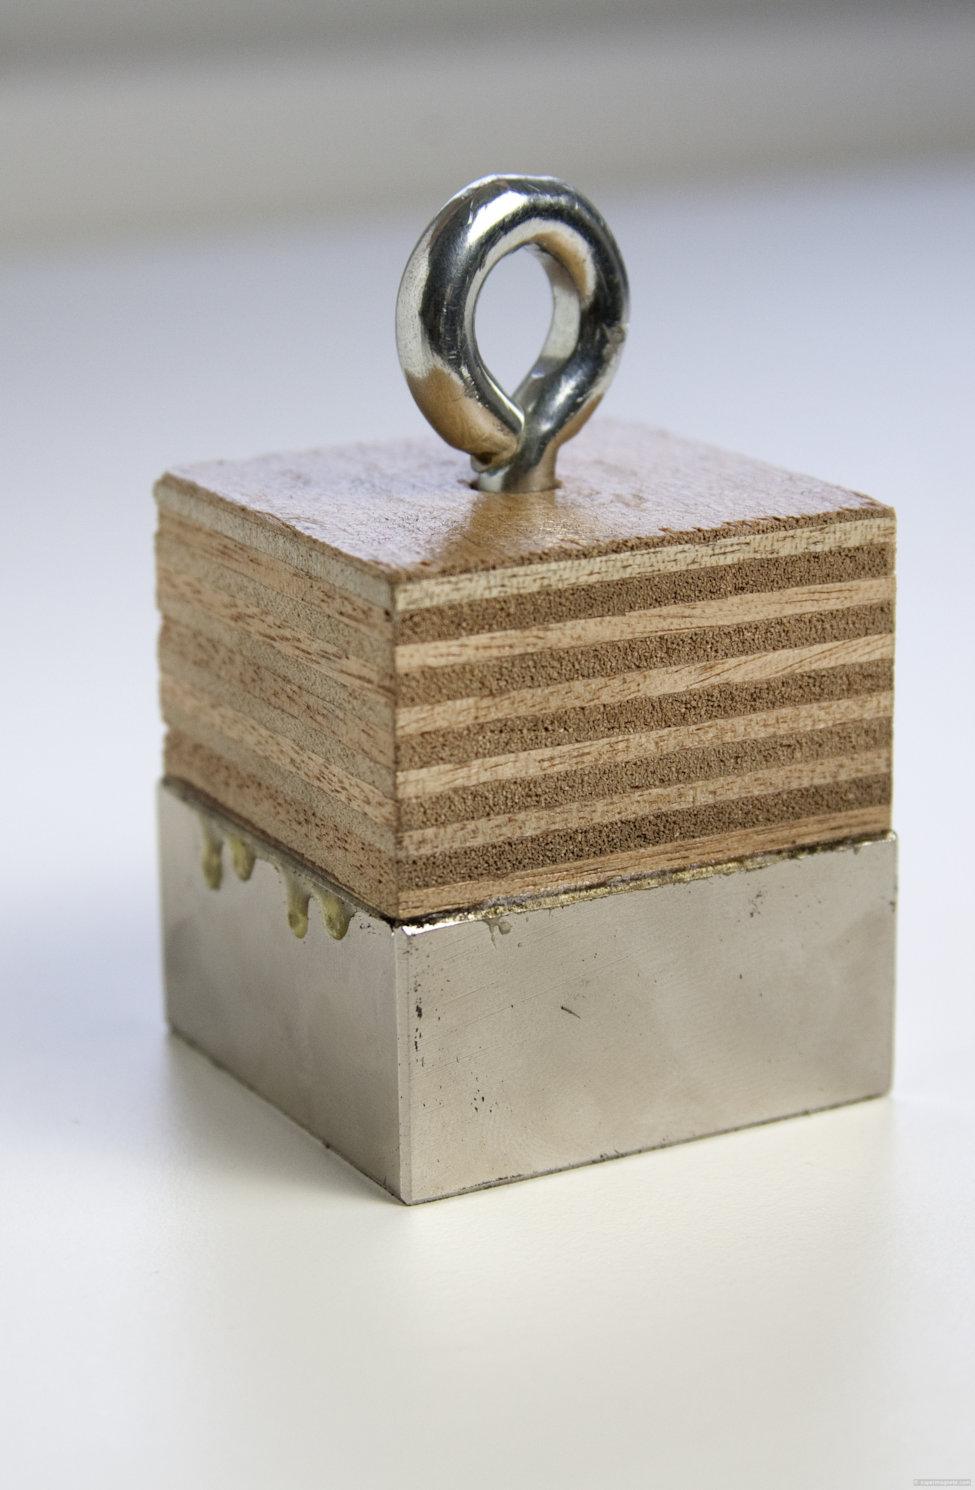 haftkraft von magneten bestimmen seri se methode. Black Bedroom Furniture Sets. Home Design Ideas